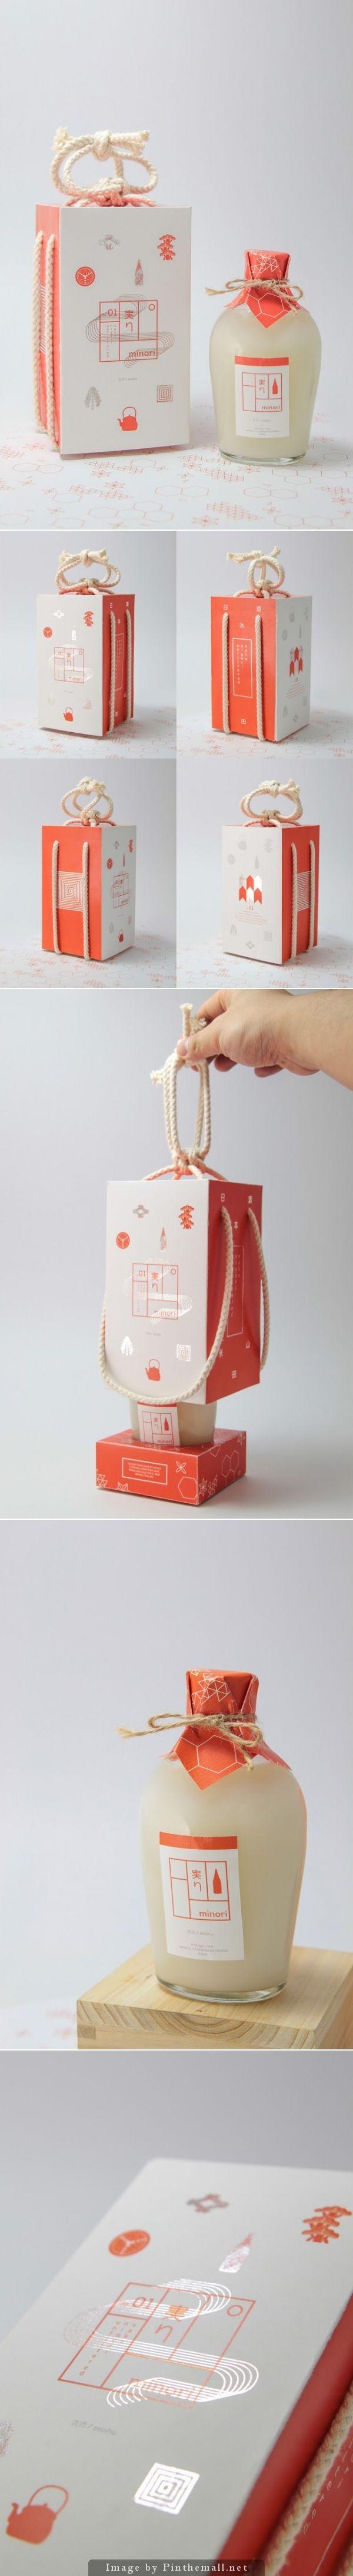 Minori #Sake (Student Project), Designer: Michael Nguyen - http://www.packagingoftheworld.com/2014/10/minori-sake-student-project.html